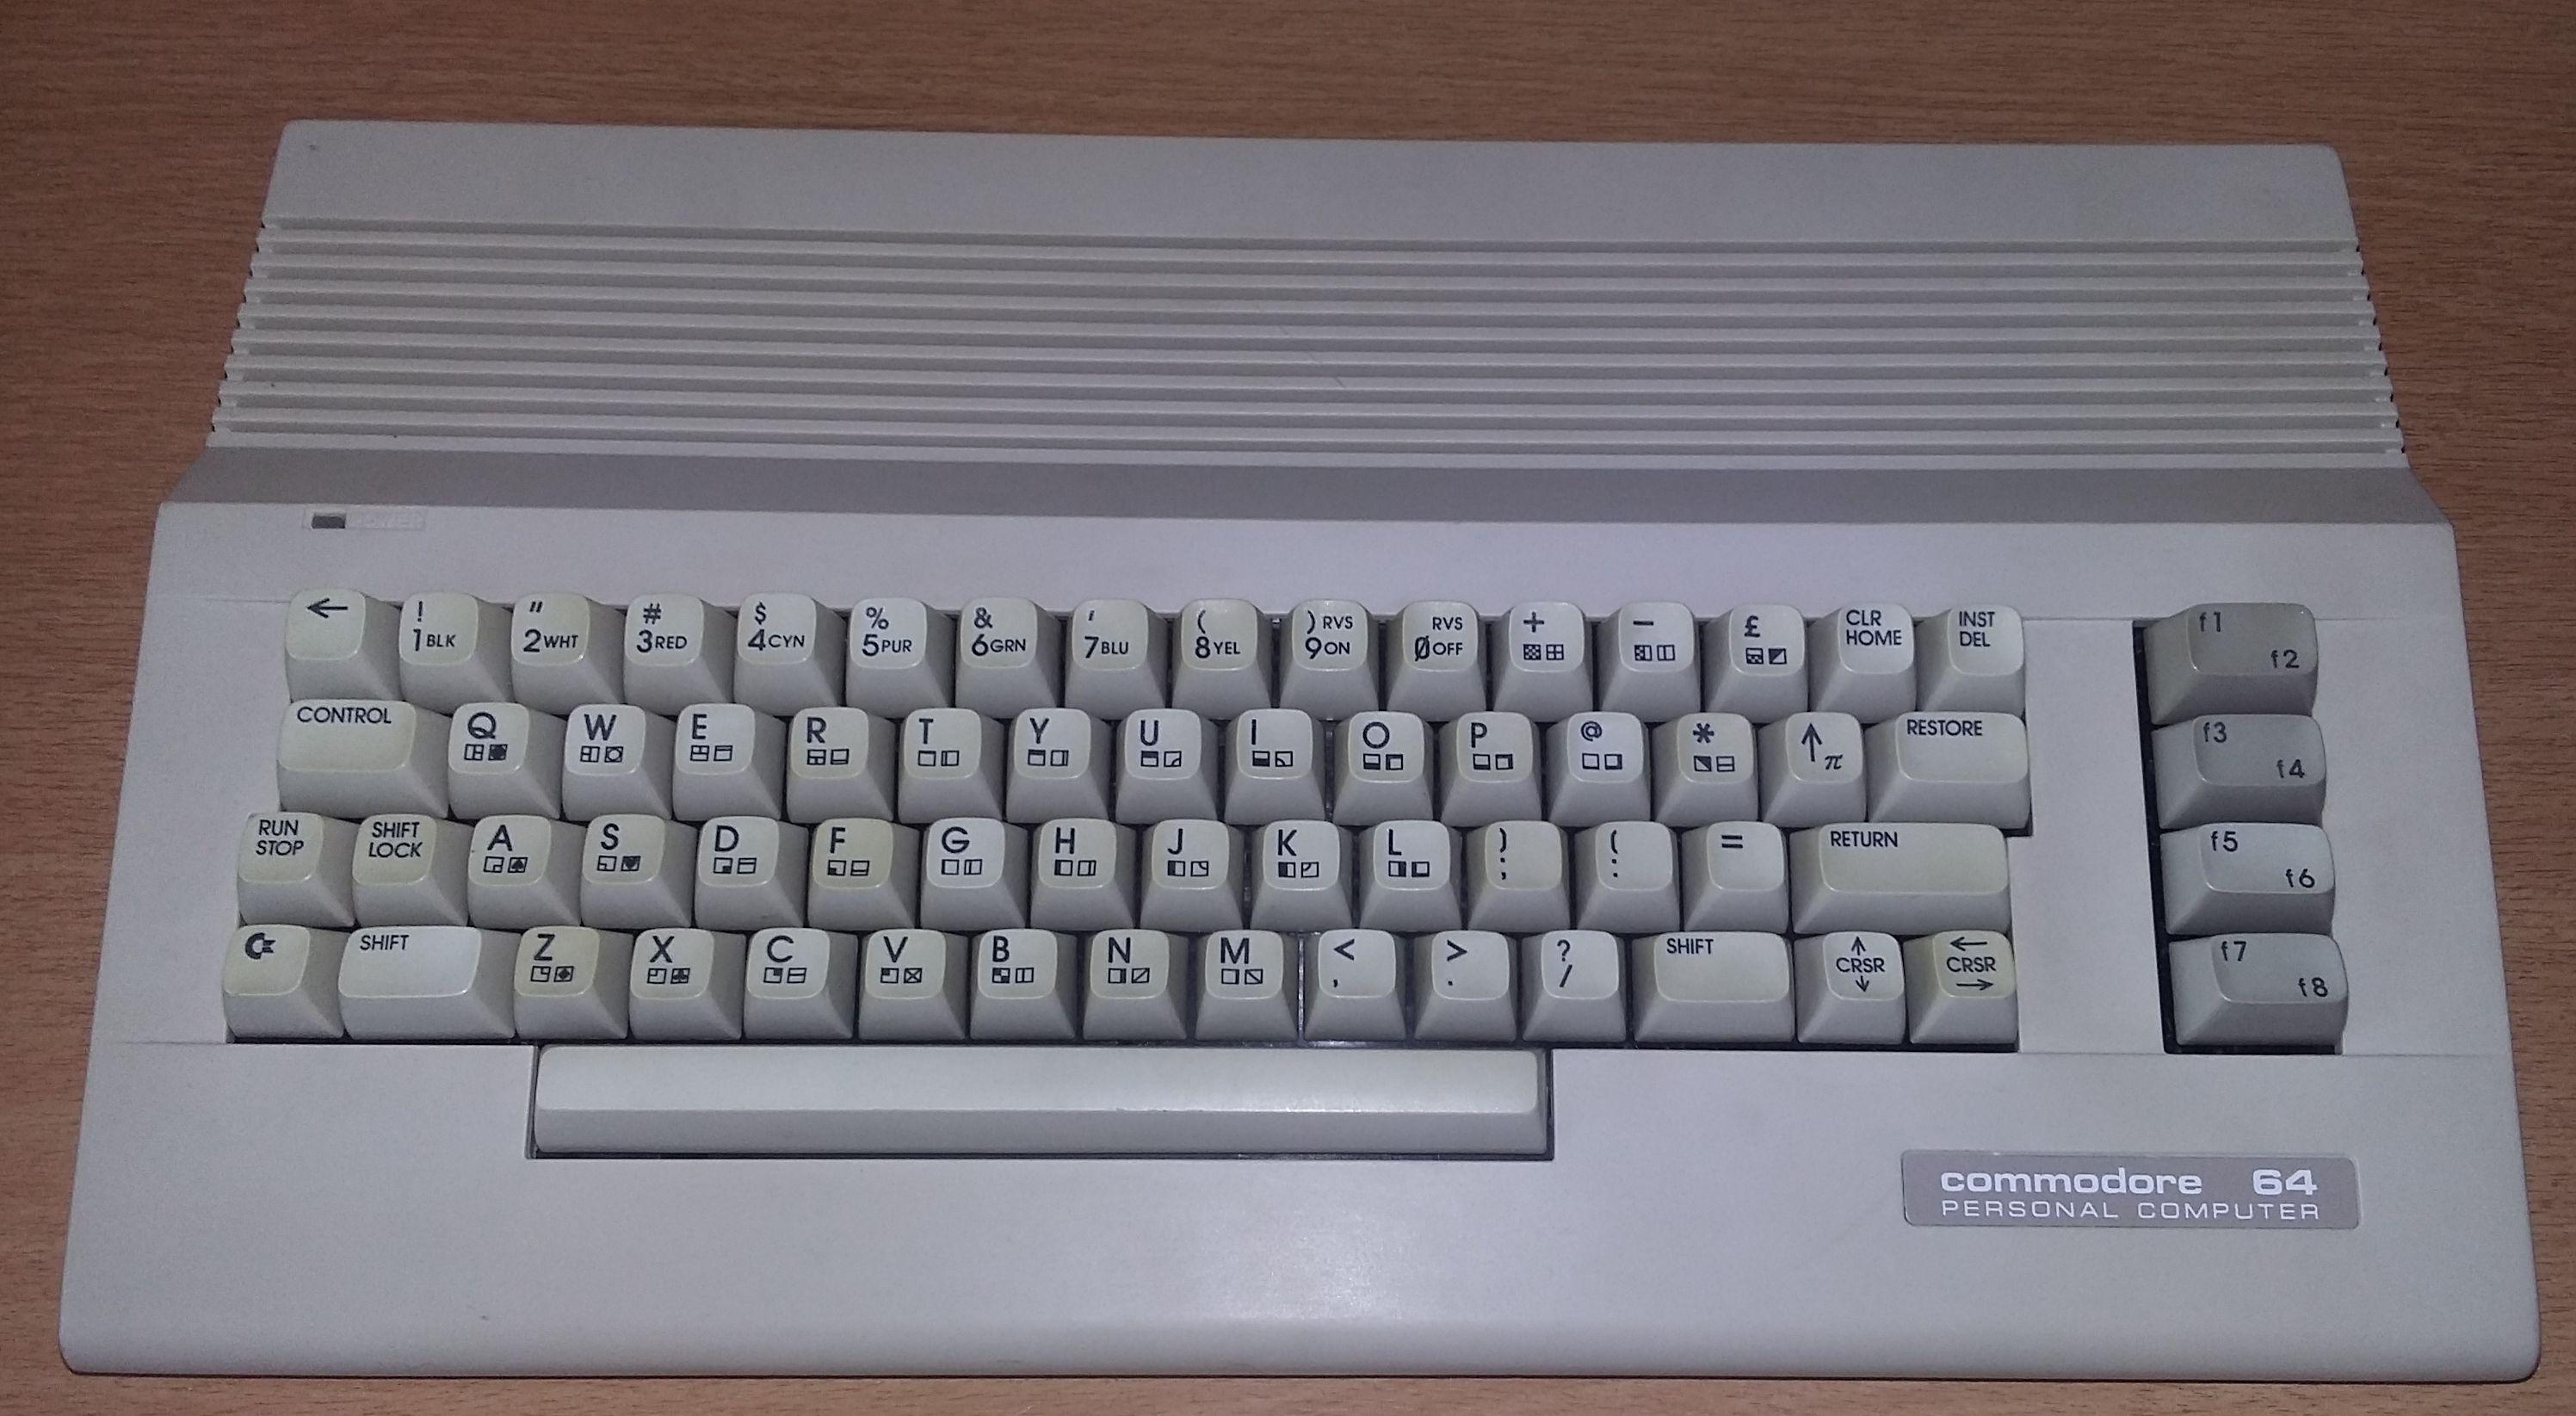 http://retrokomp.org/wp-content/uploads/Drygol-C64-1-1.jpg